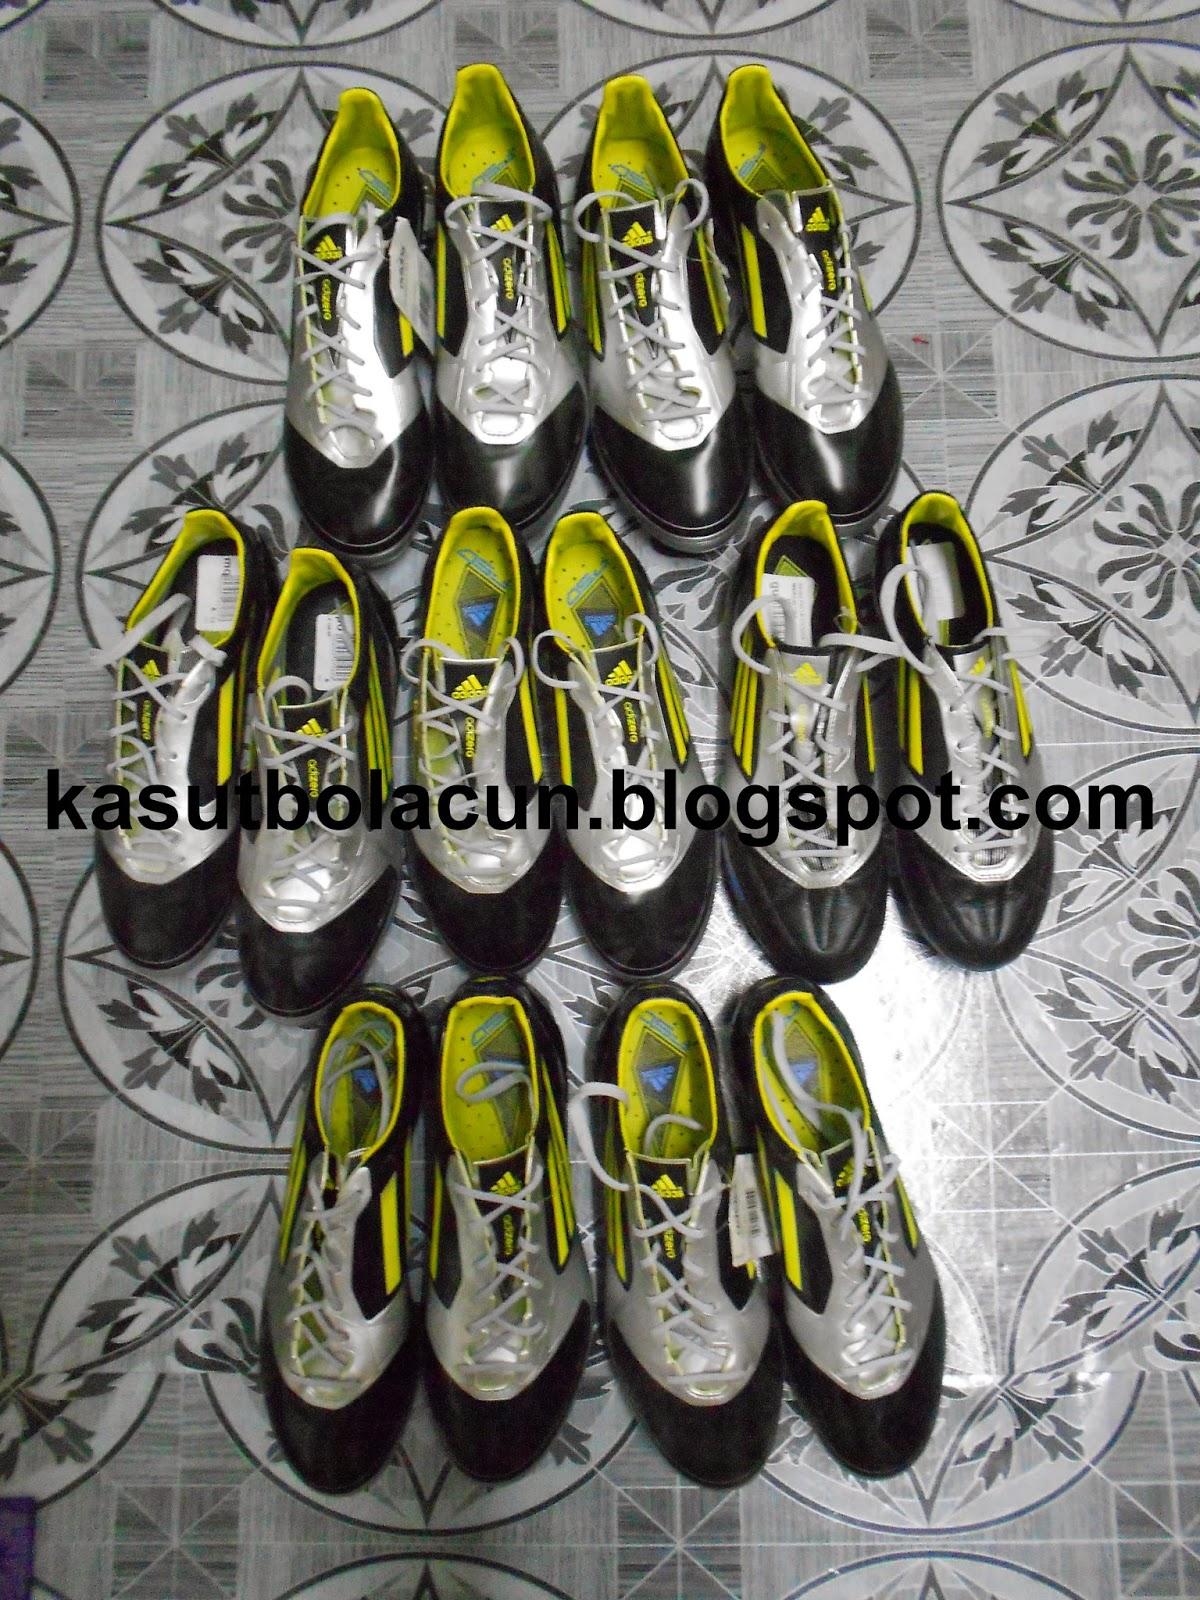 http://kasutbolacun.blogspot.com/2014/09/adidas-f50-adizero-micoach-1-sg-hitam.html